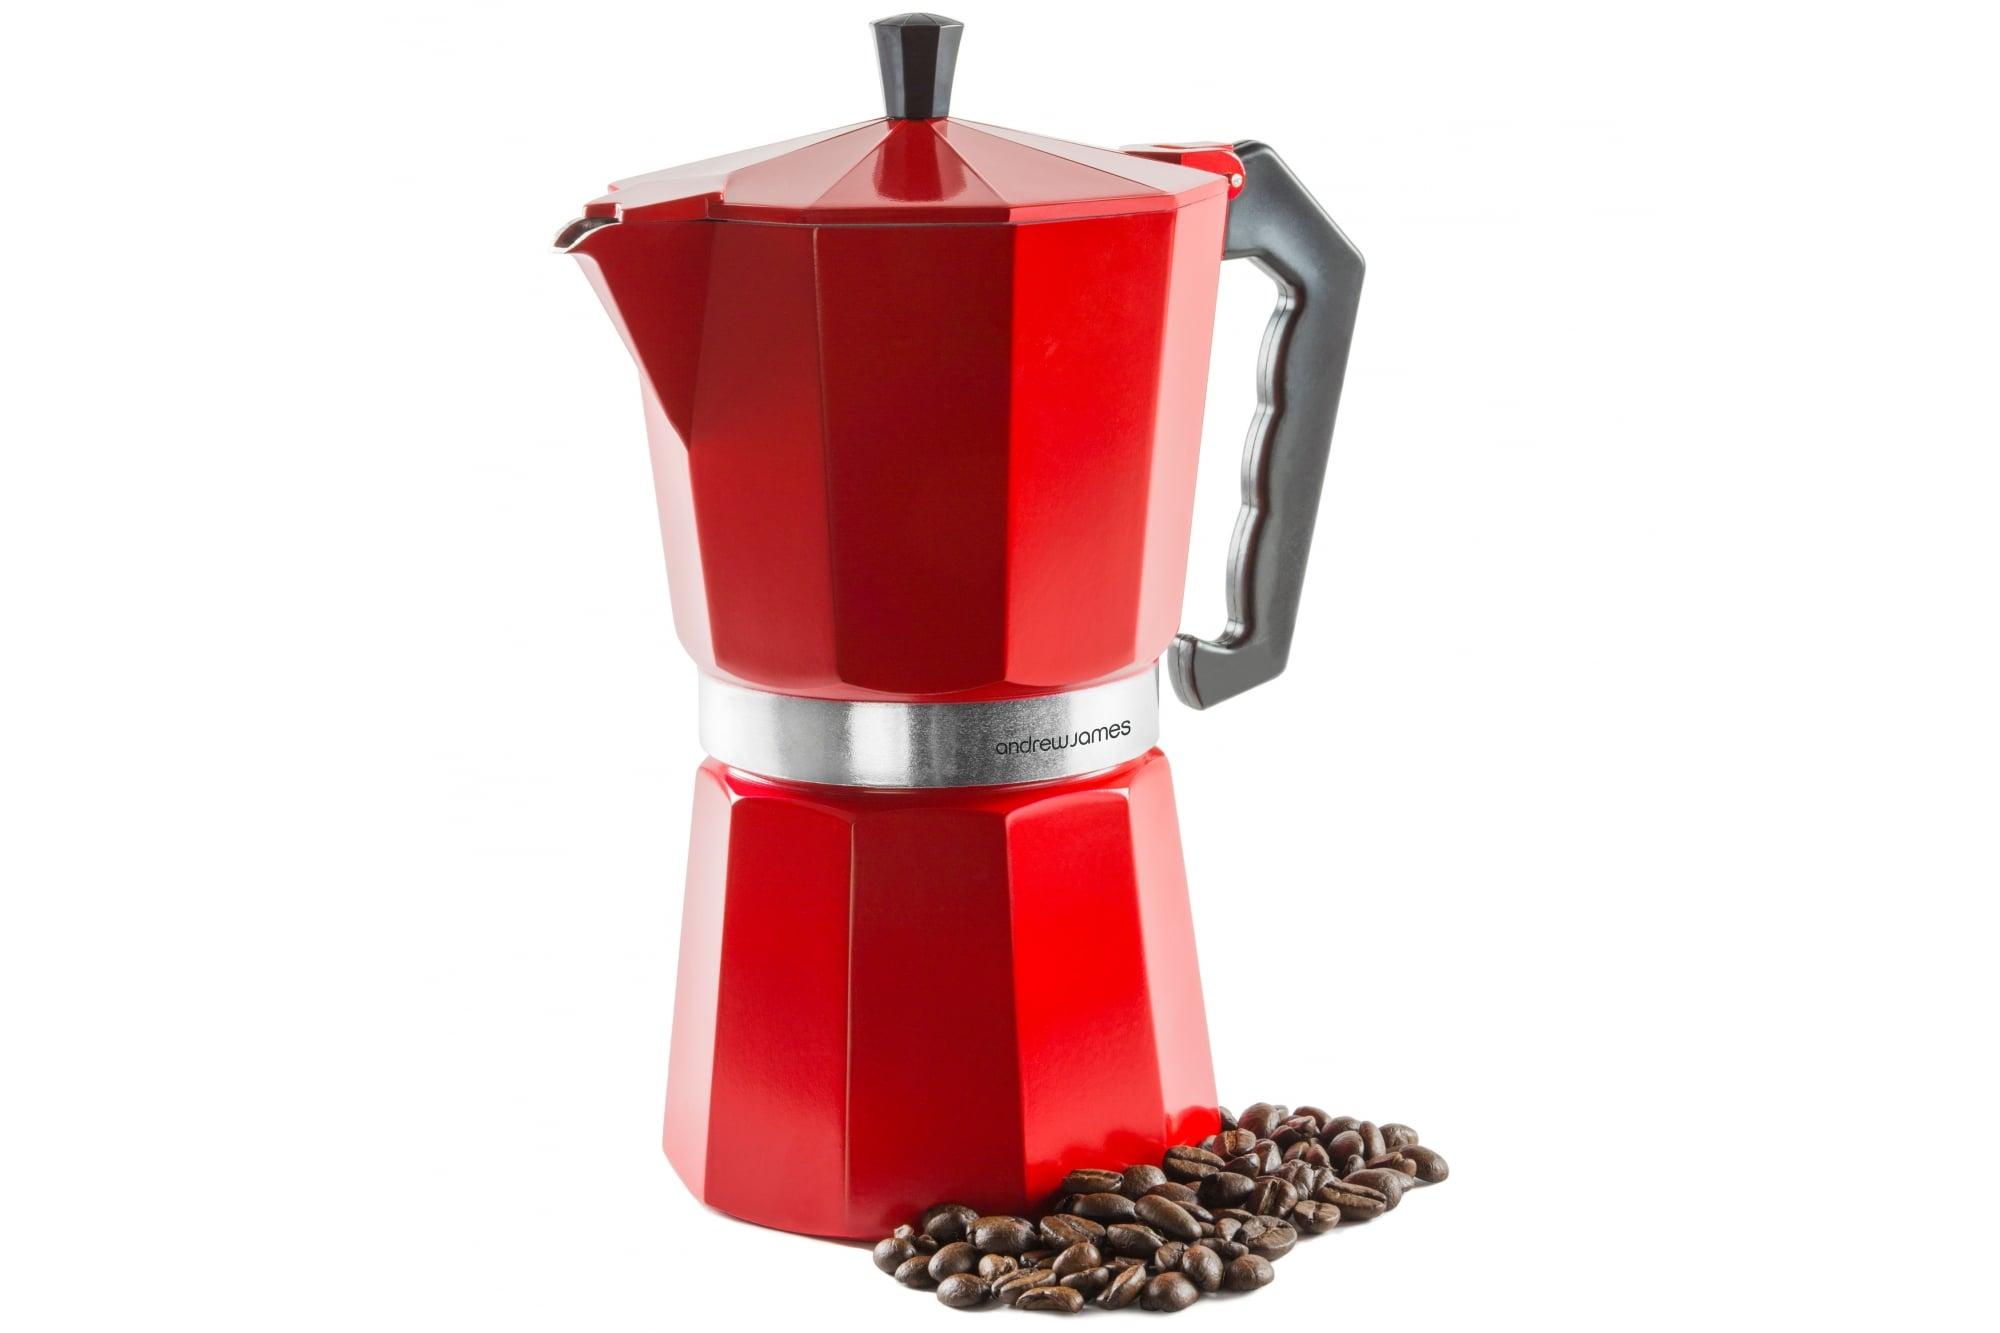 Buy Andrew James Red 9 Cup Espresso Coffee Percolator Moka Pot